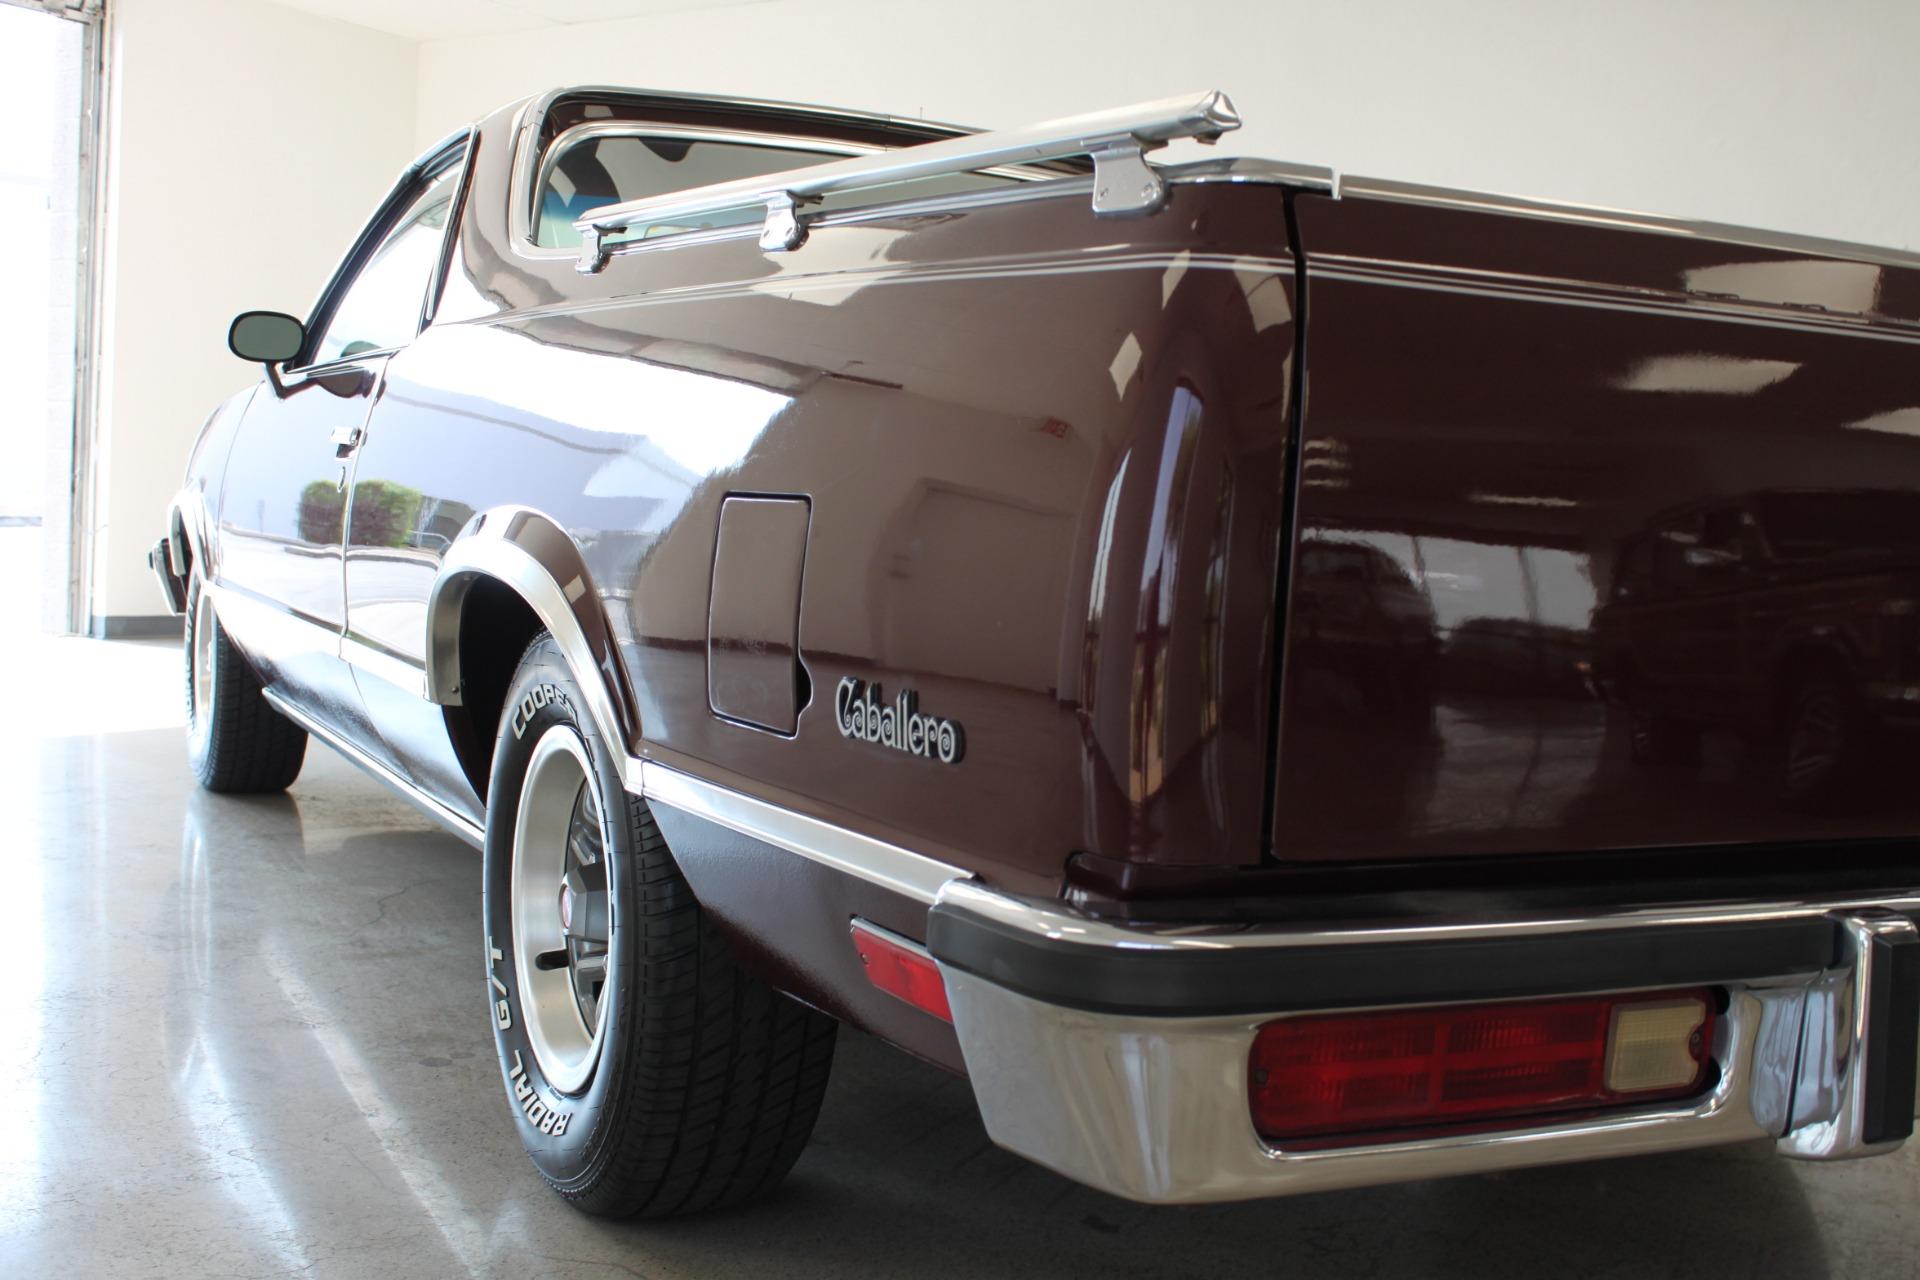 Used-1984-GMC-Caballero-Camaro